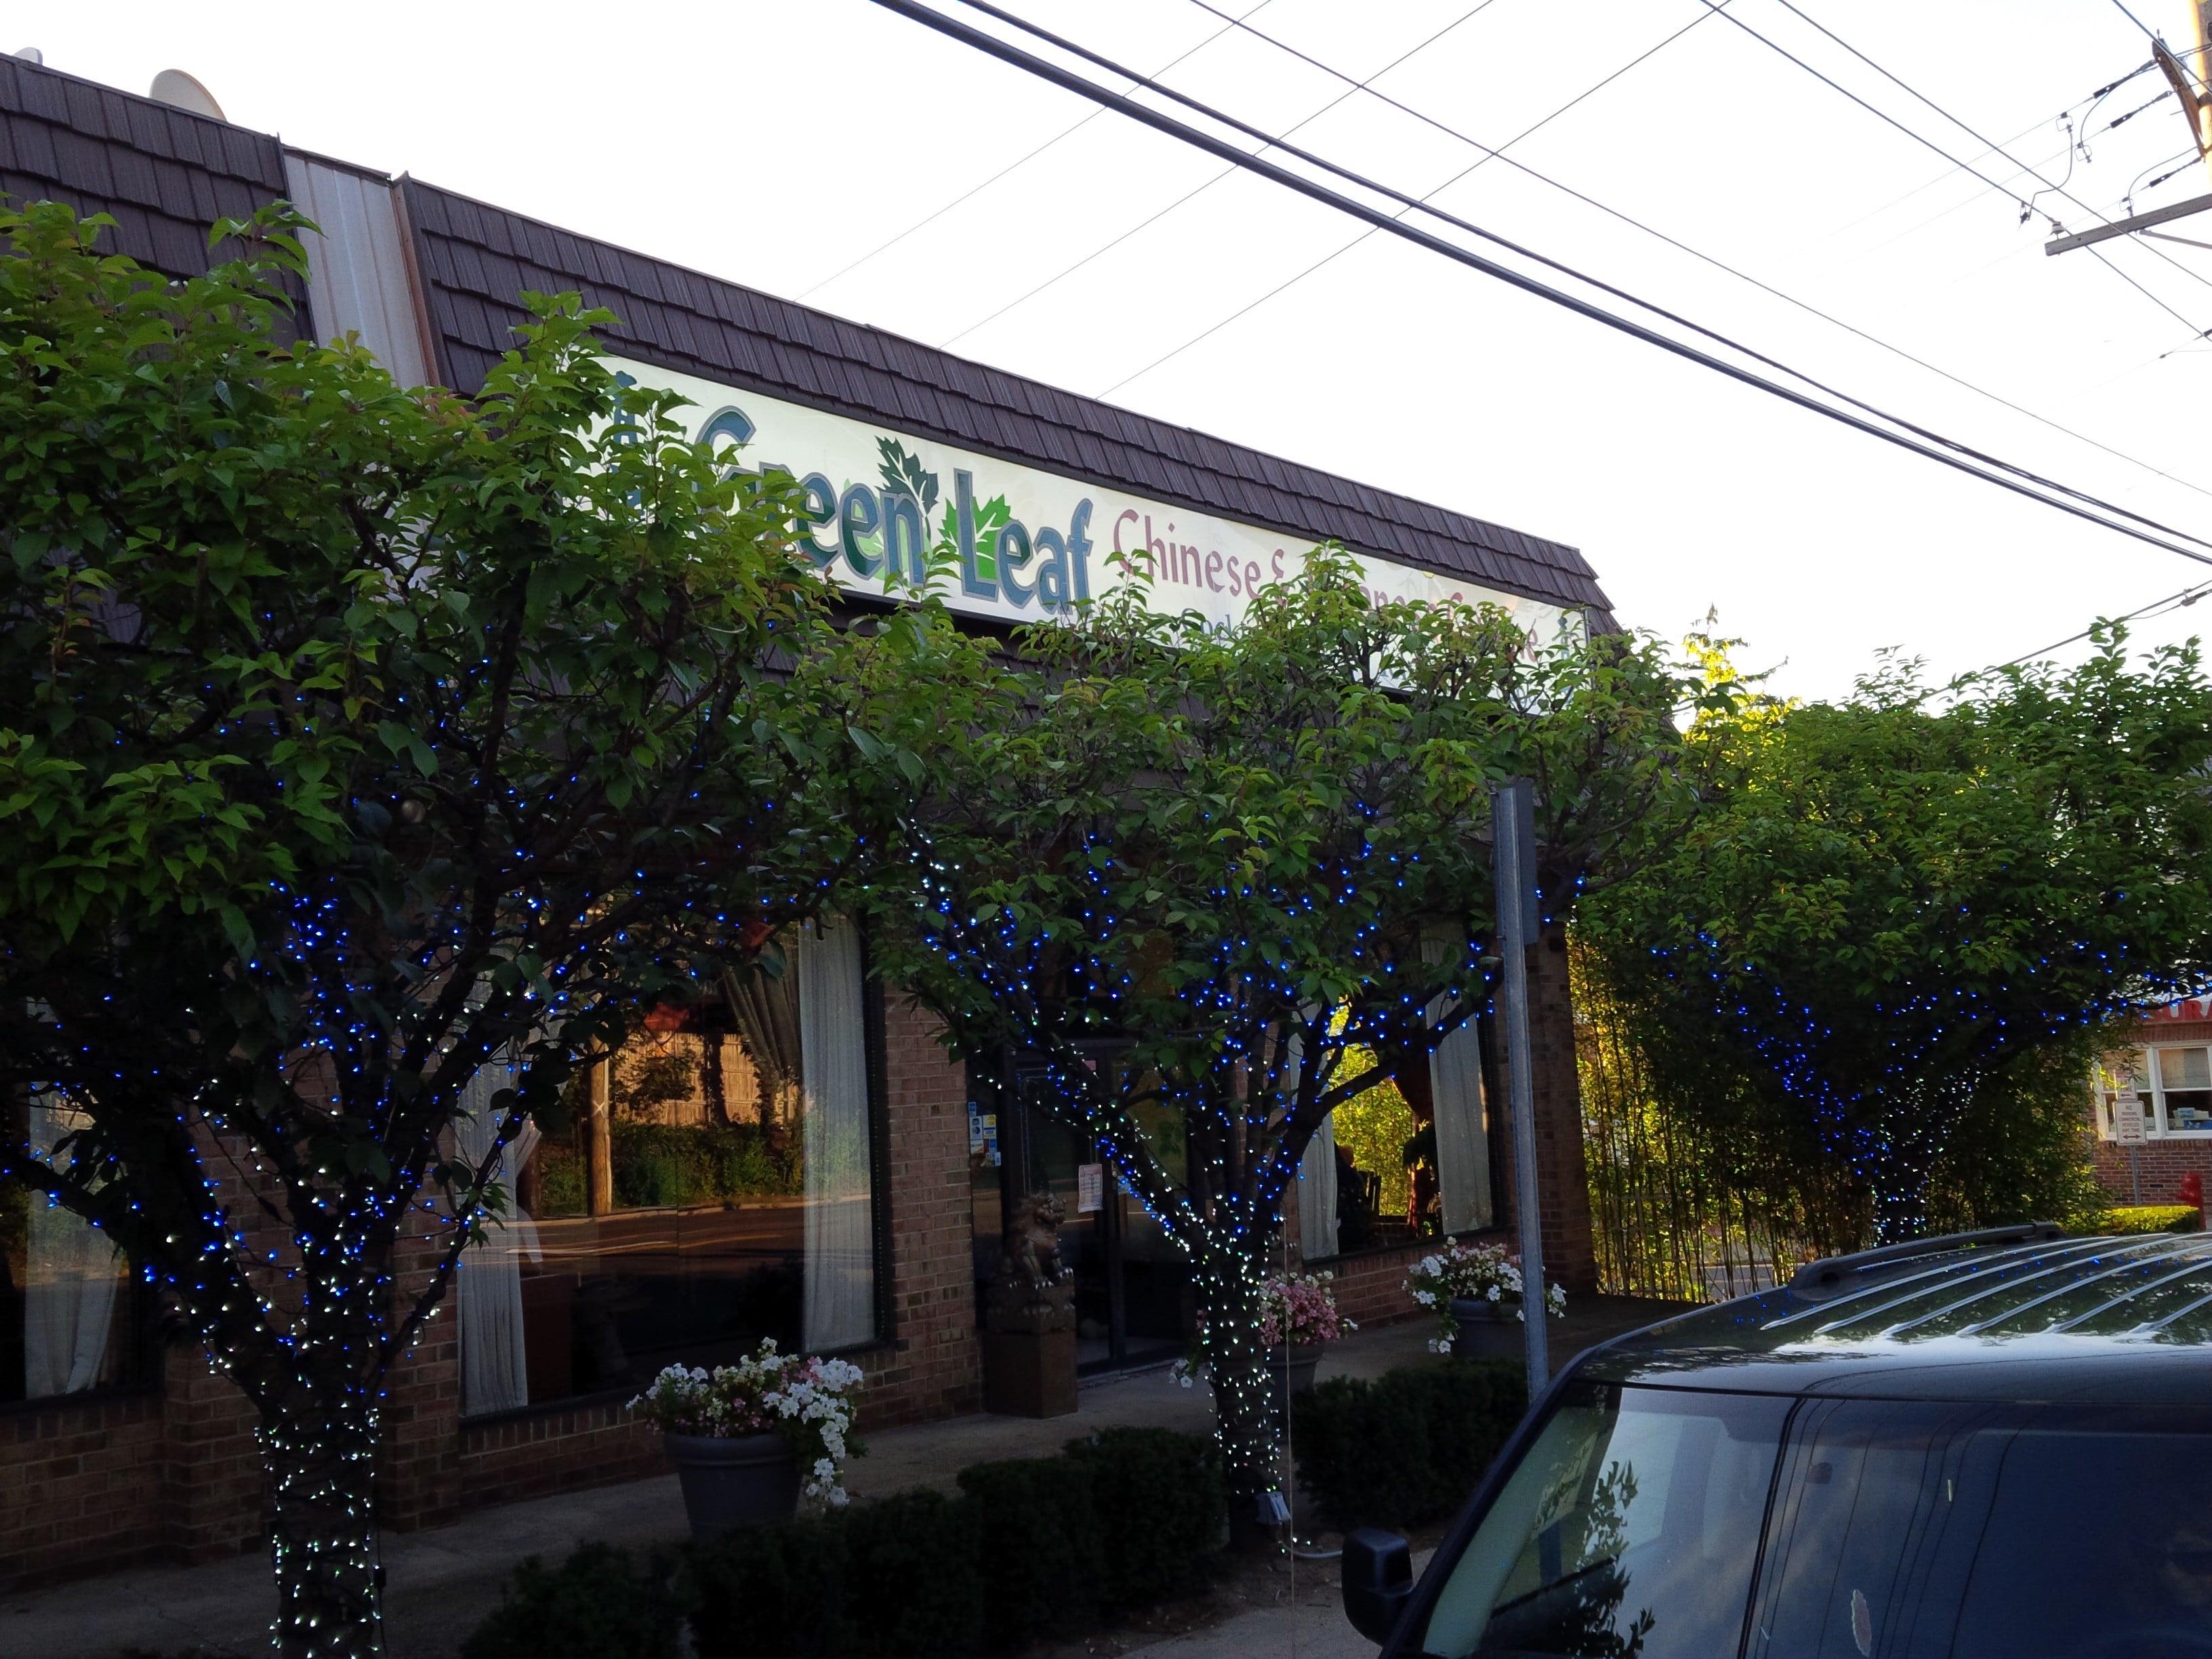 [REVIEW] Green Leaf, Port Washington (Closed 7/2016)